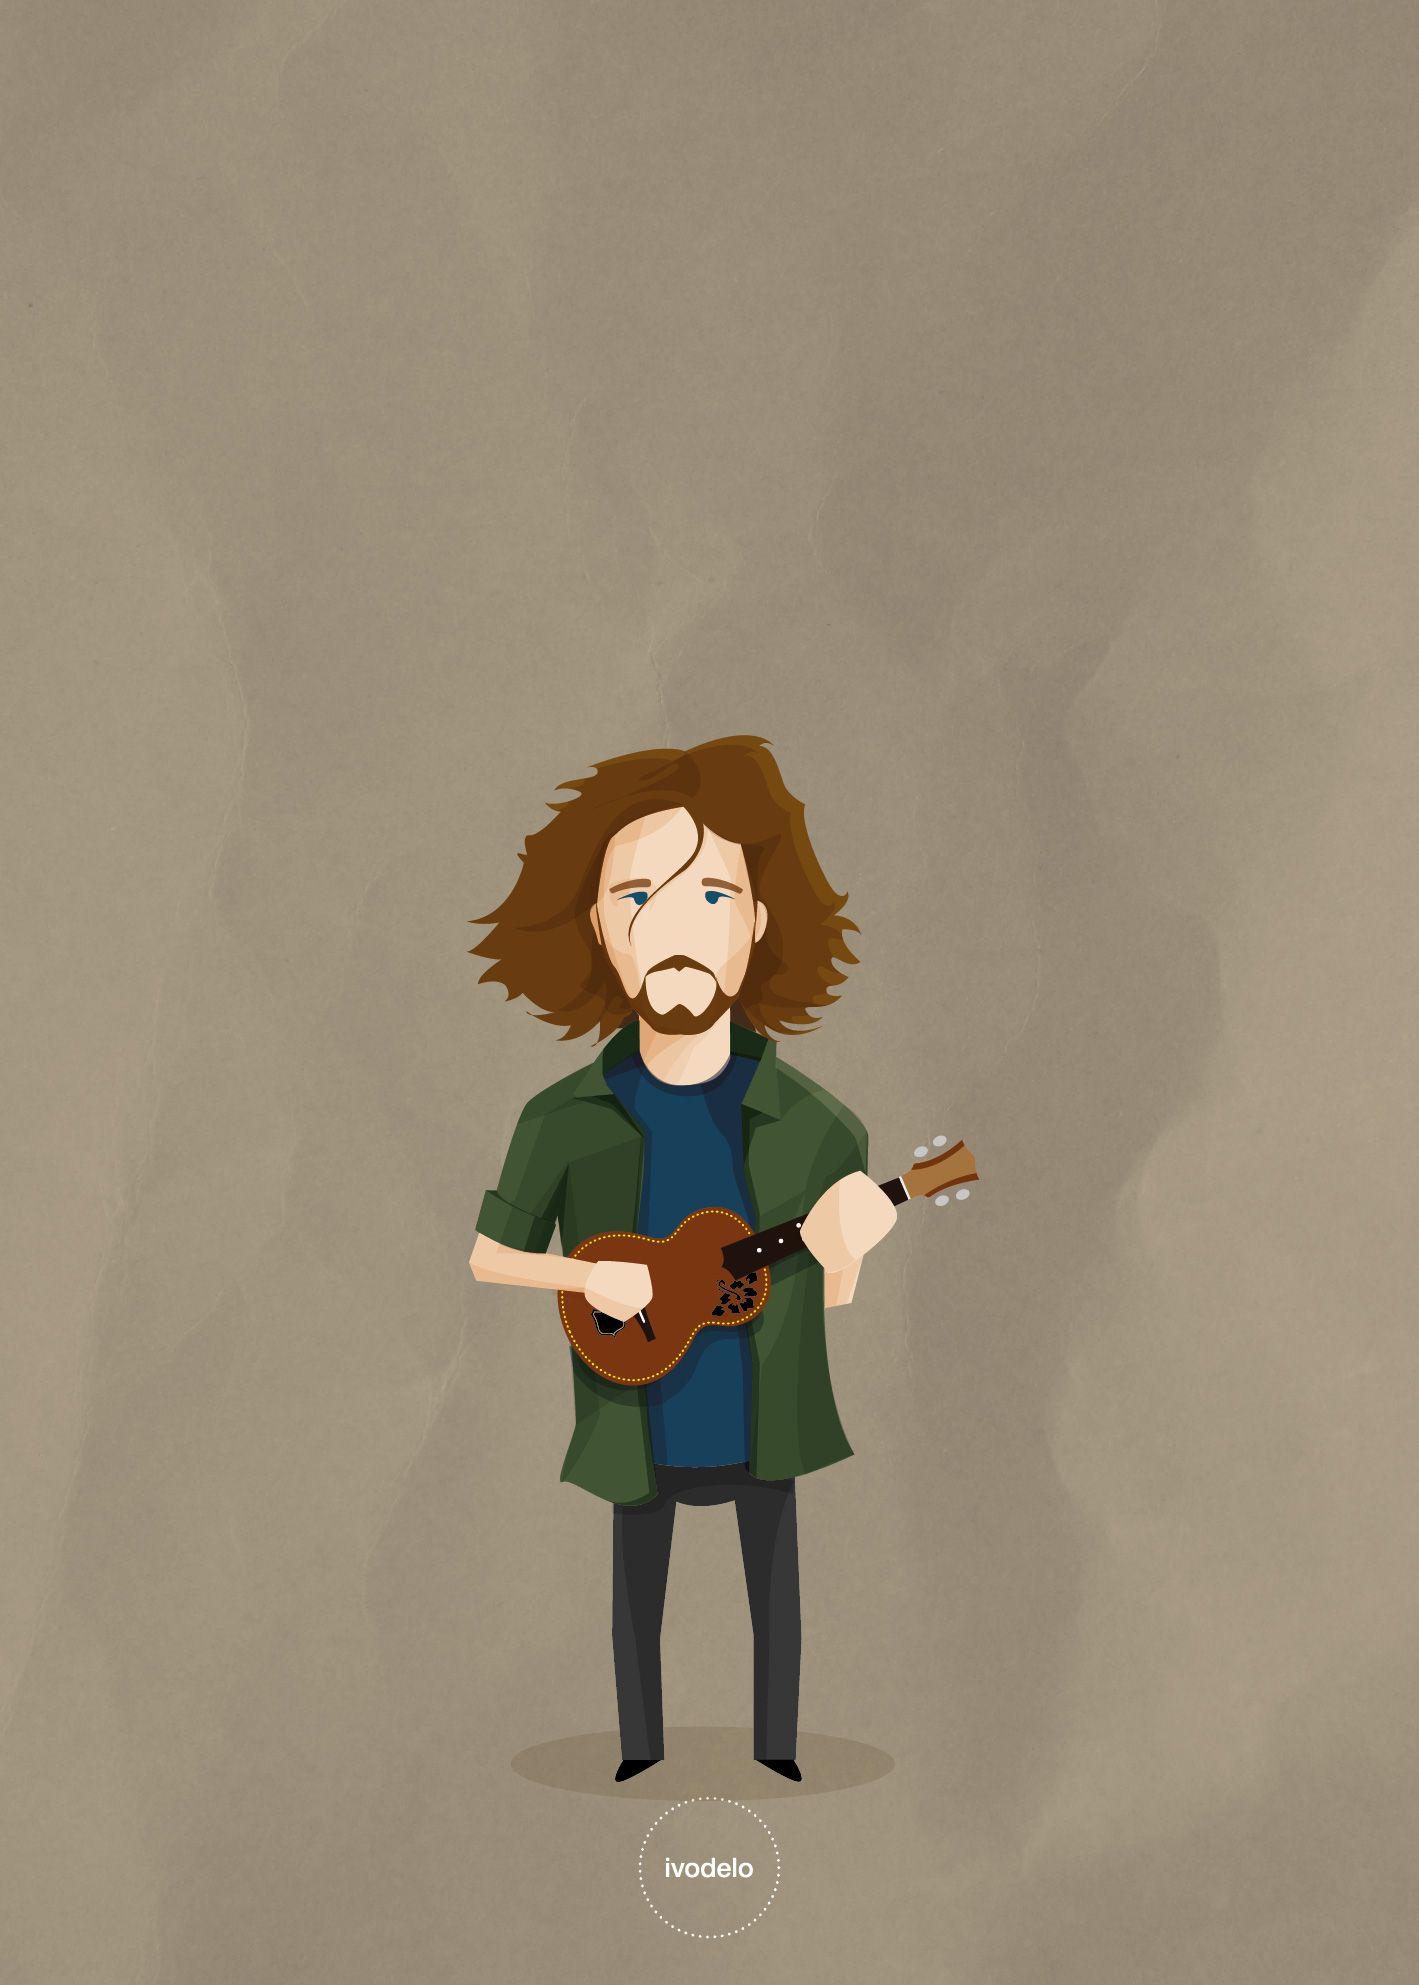 Eddie Vedder Ivodelo Eddie Vedder Vedder Ilustraciones